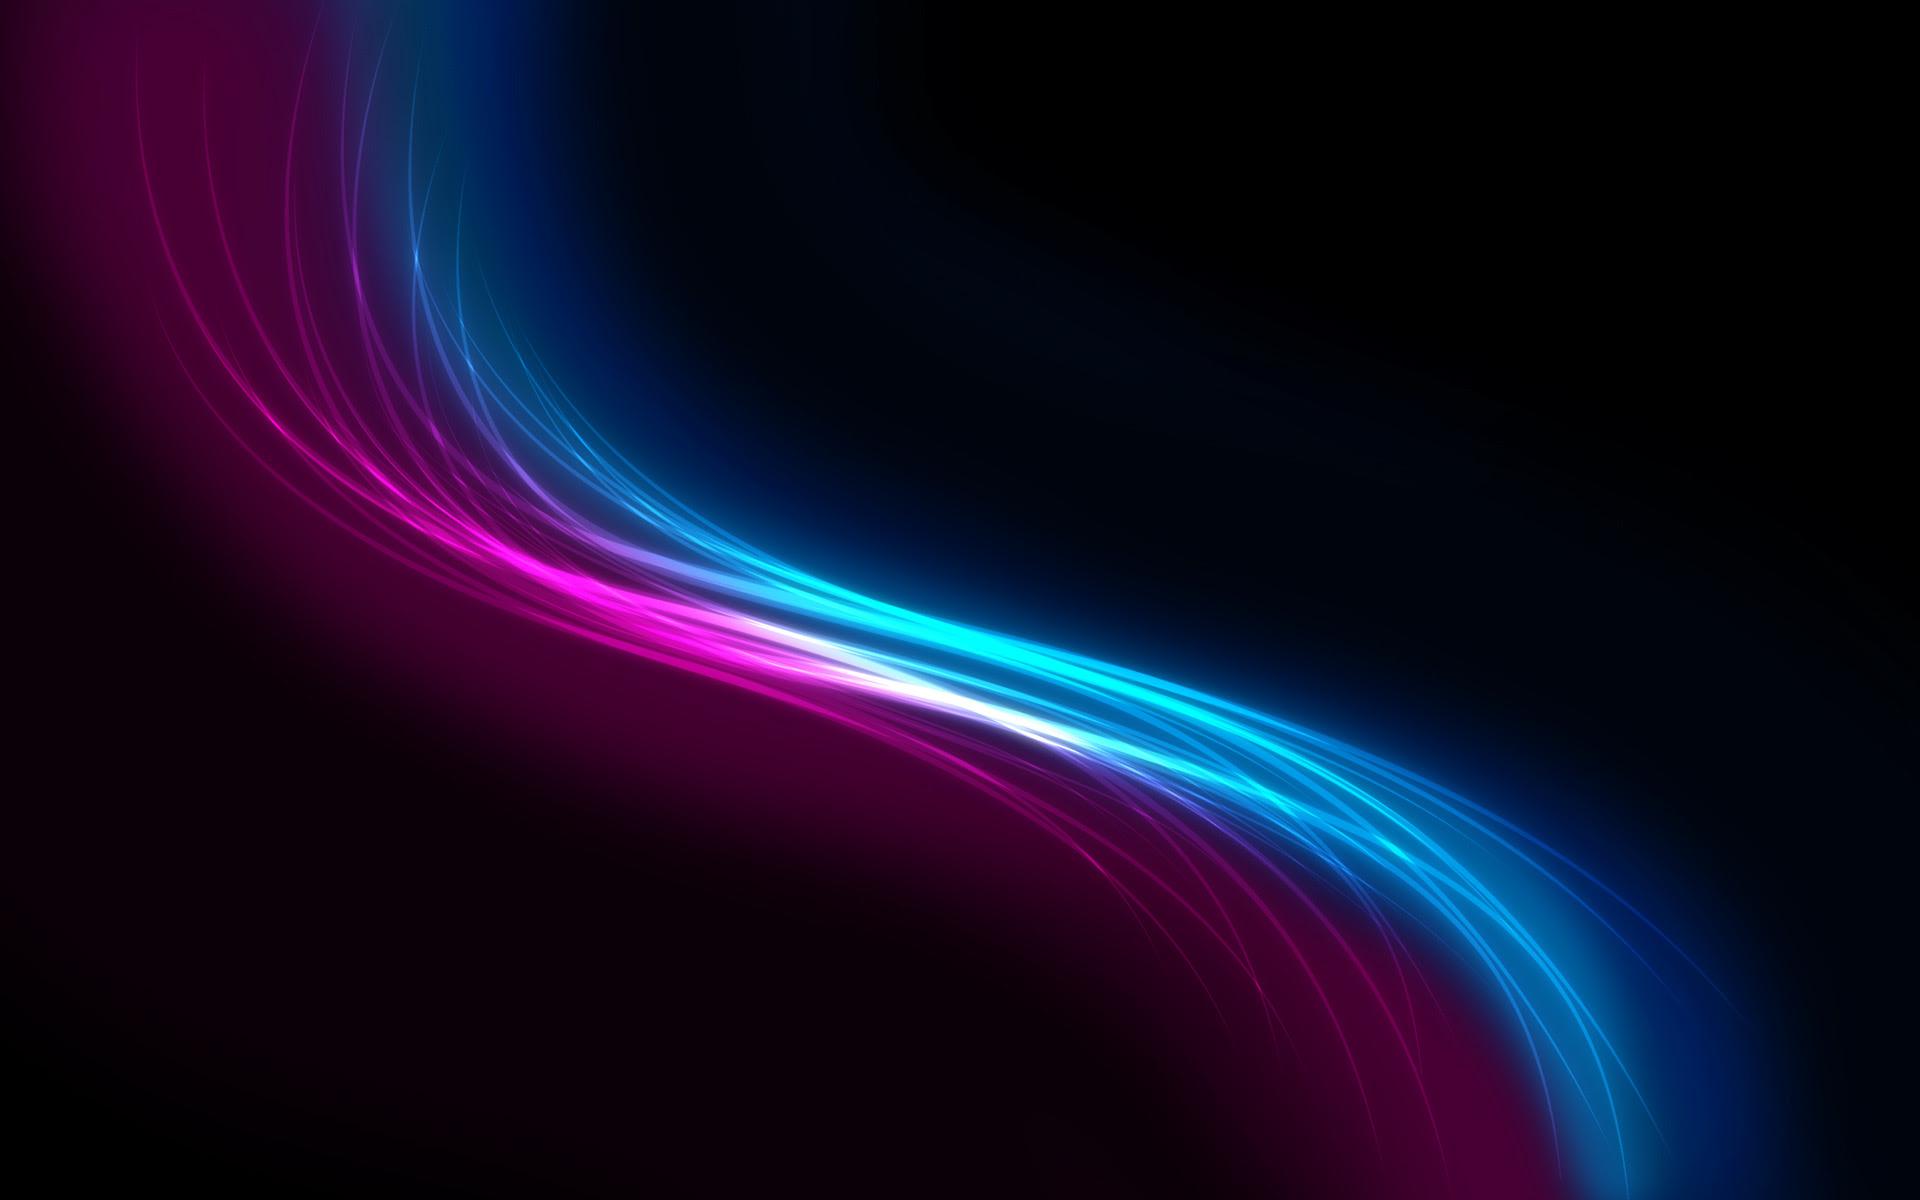 Glow In The Dark Wallpaper 1920x1200 57034